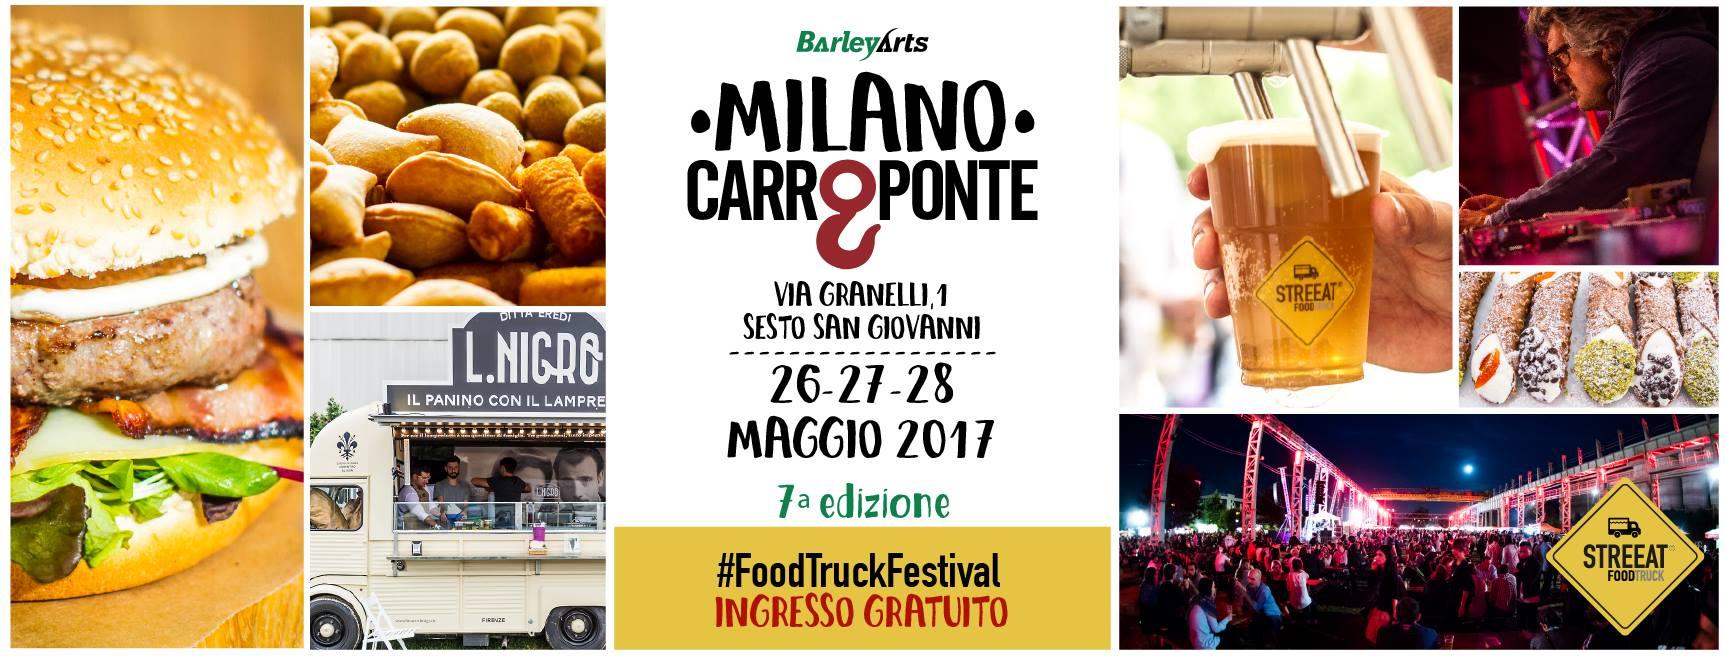 Street Food al Carroponte  Milano Life